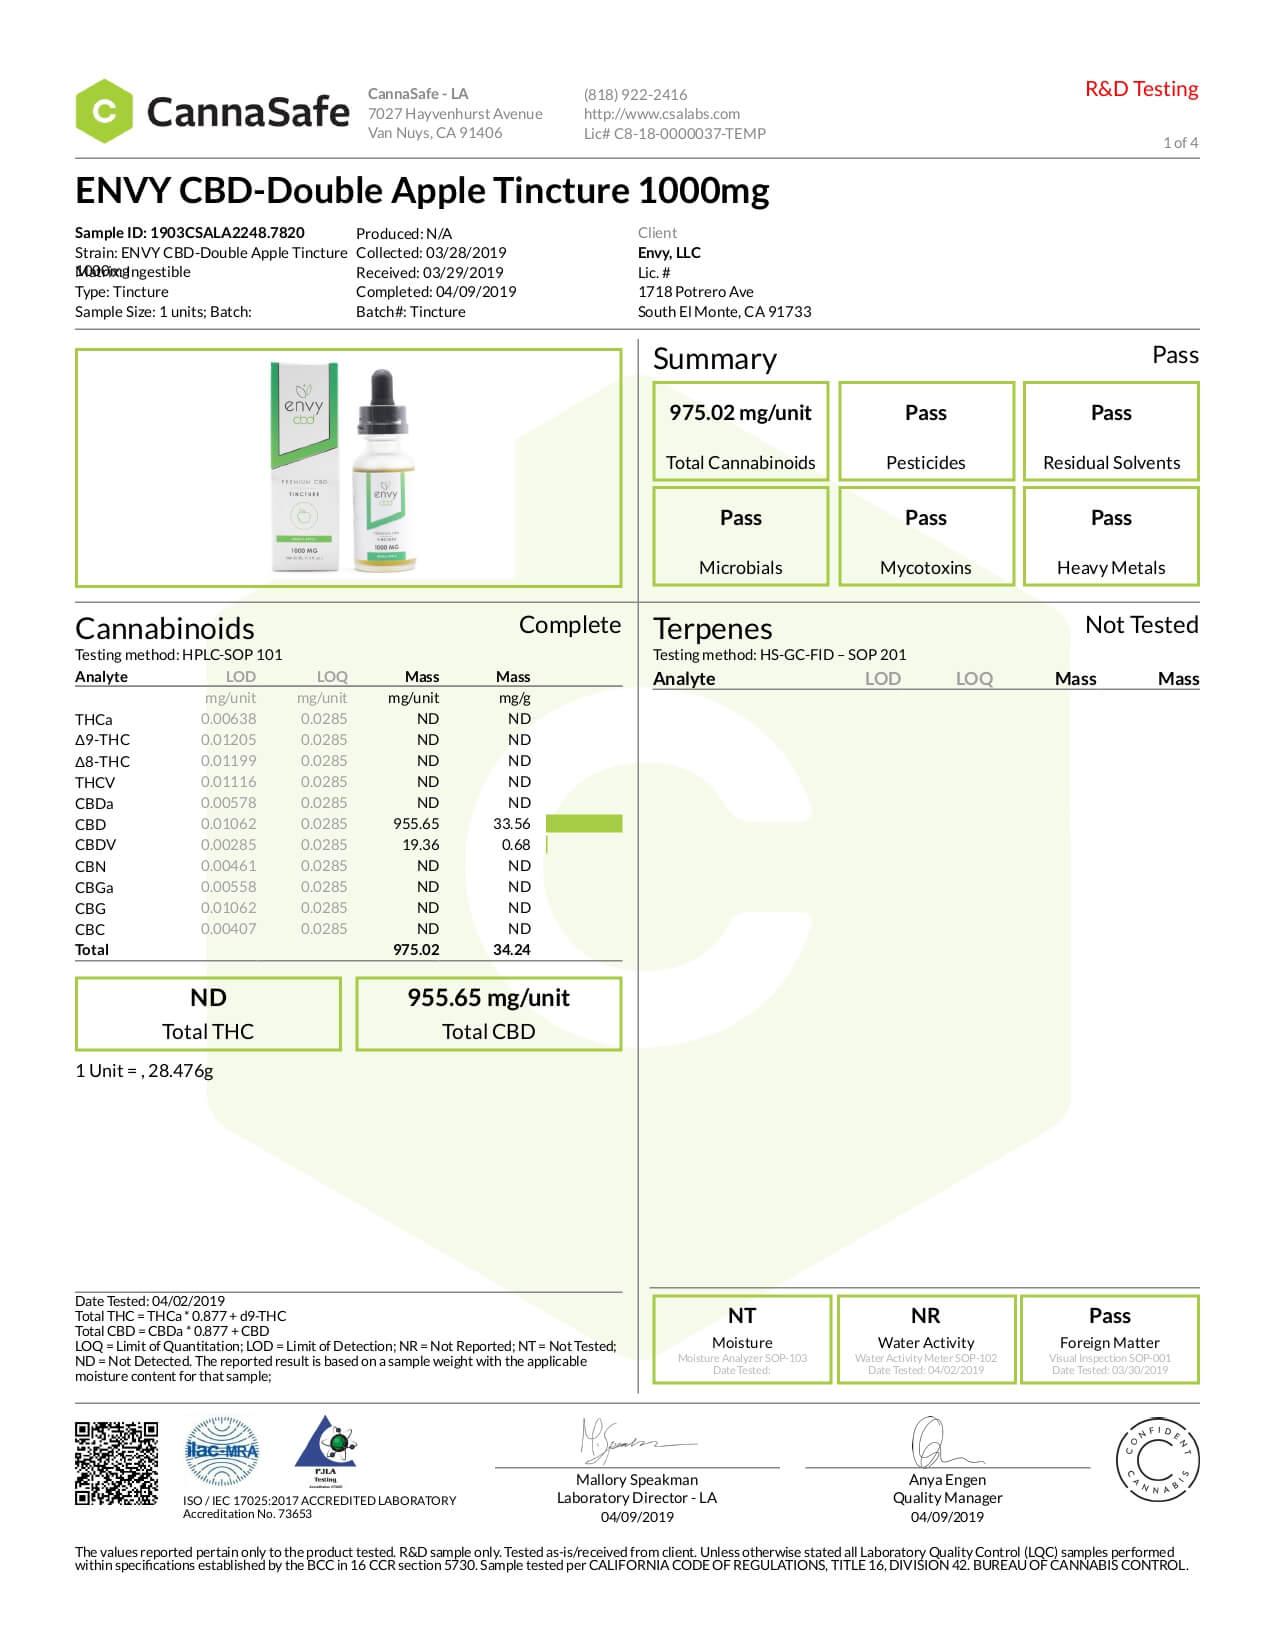 ENVY CBD Tincture Double Apple 1000mg Lab Report